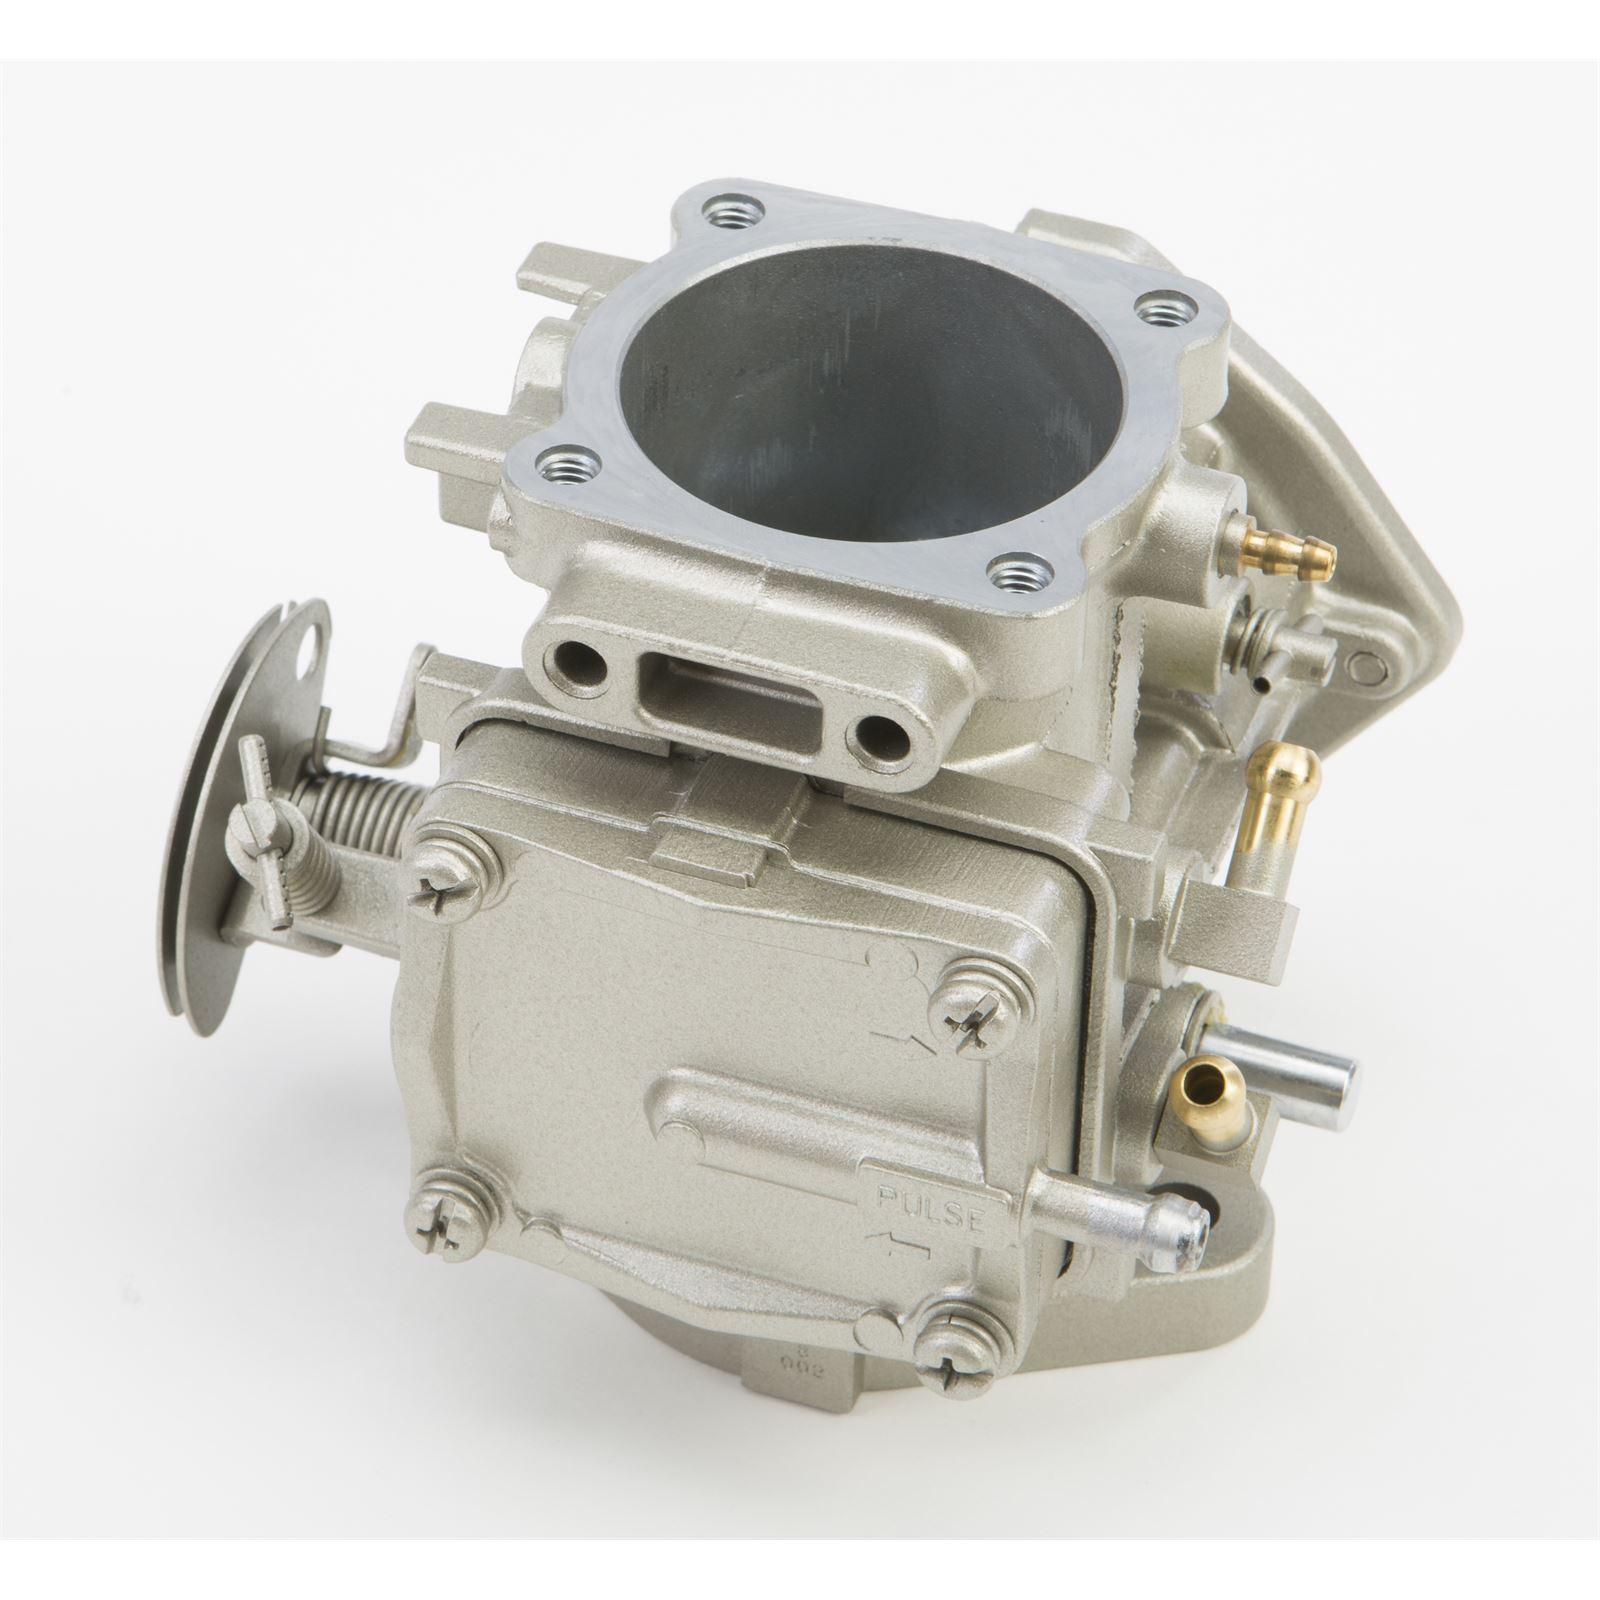 Mikuni High Performance Super BN Carburetor